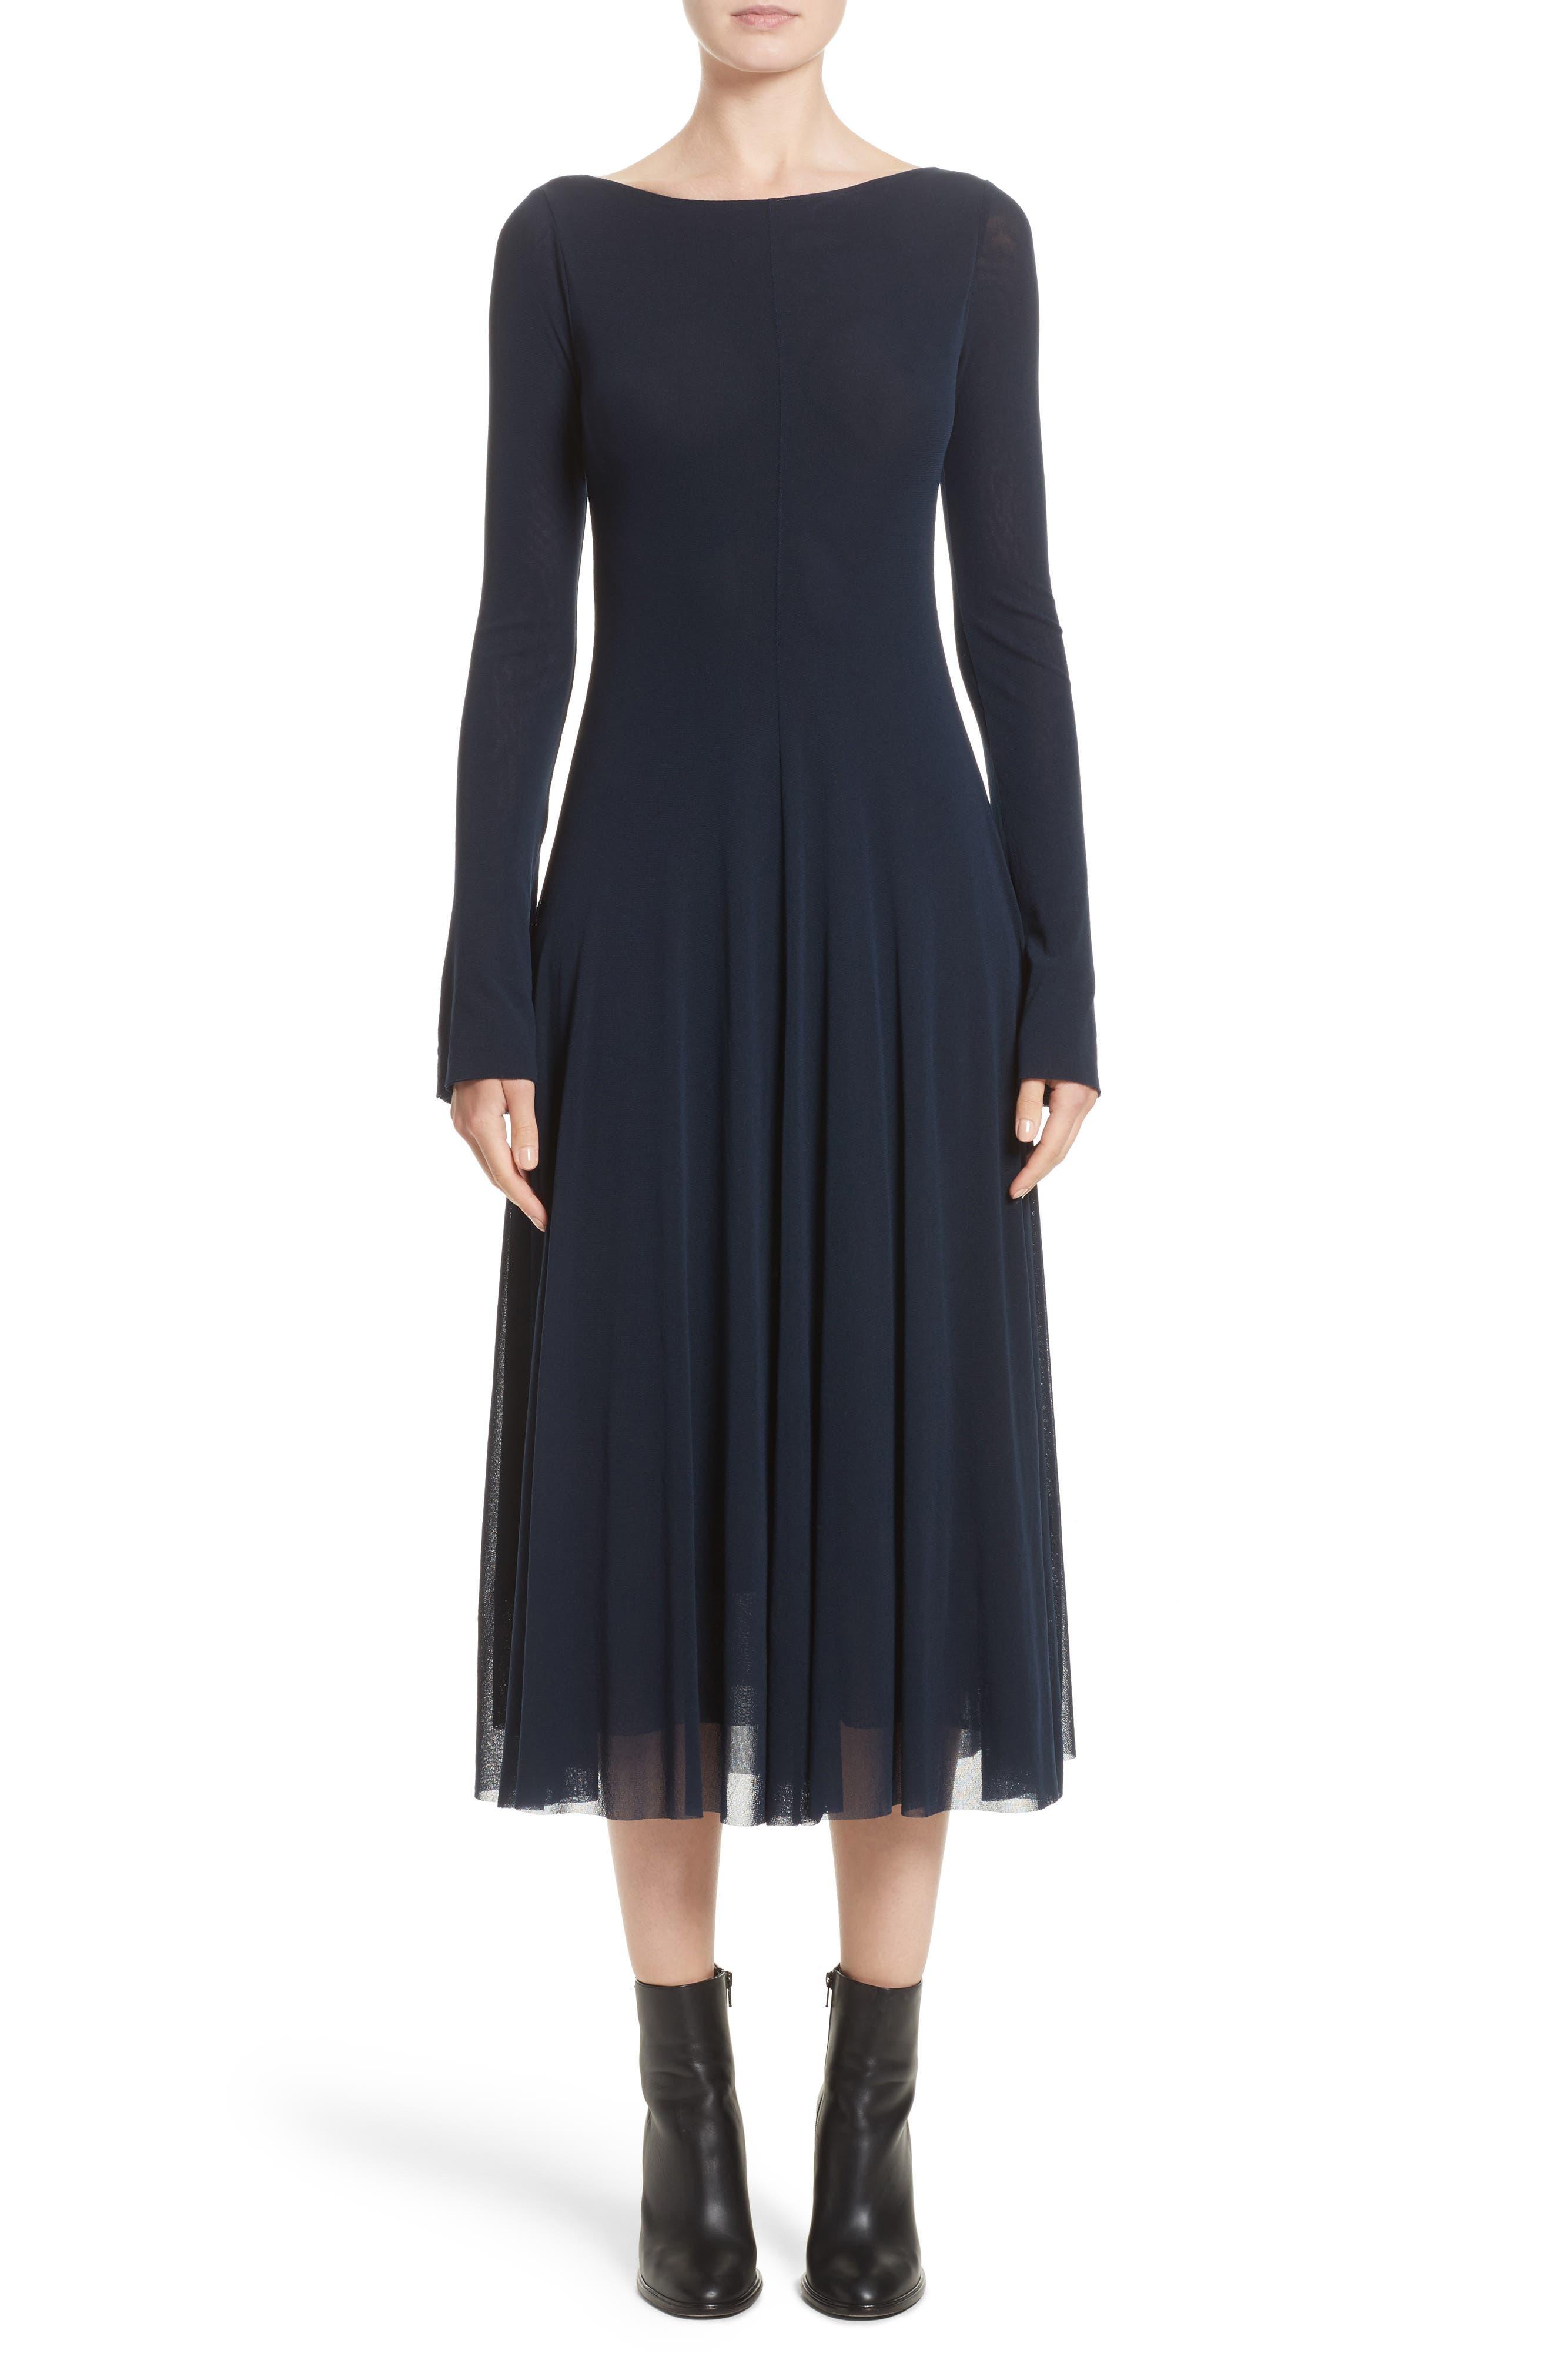 Main Image - Fuzzi Reversible Tulle Dress